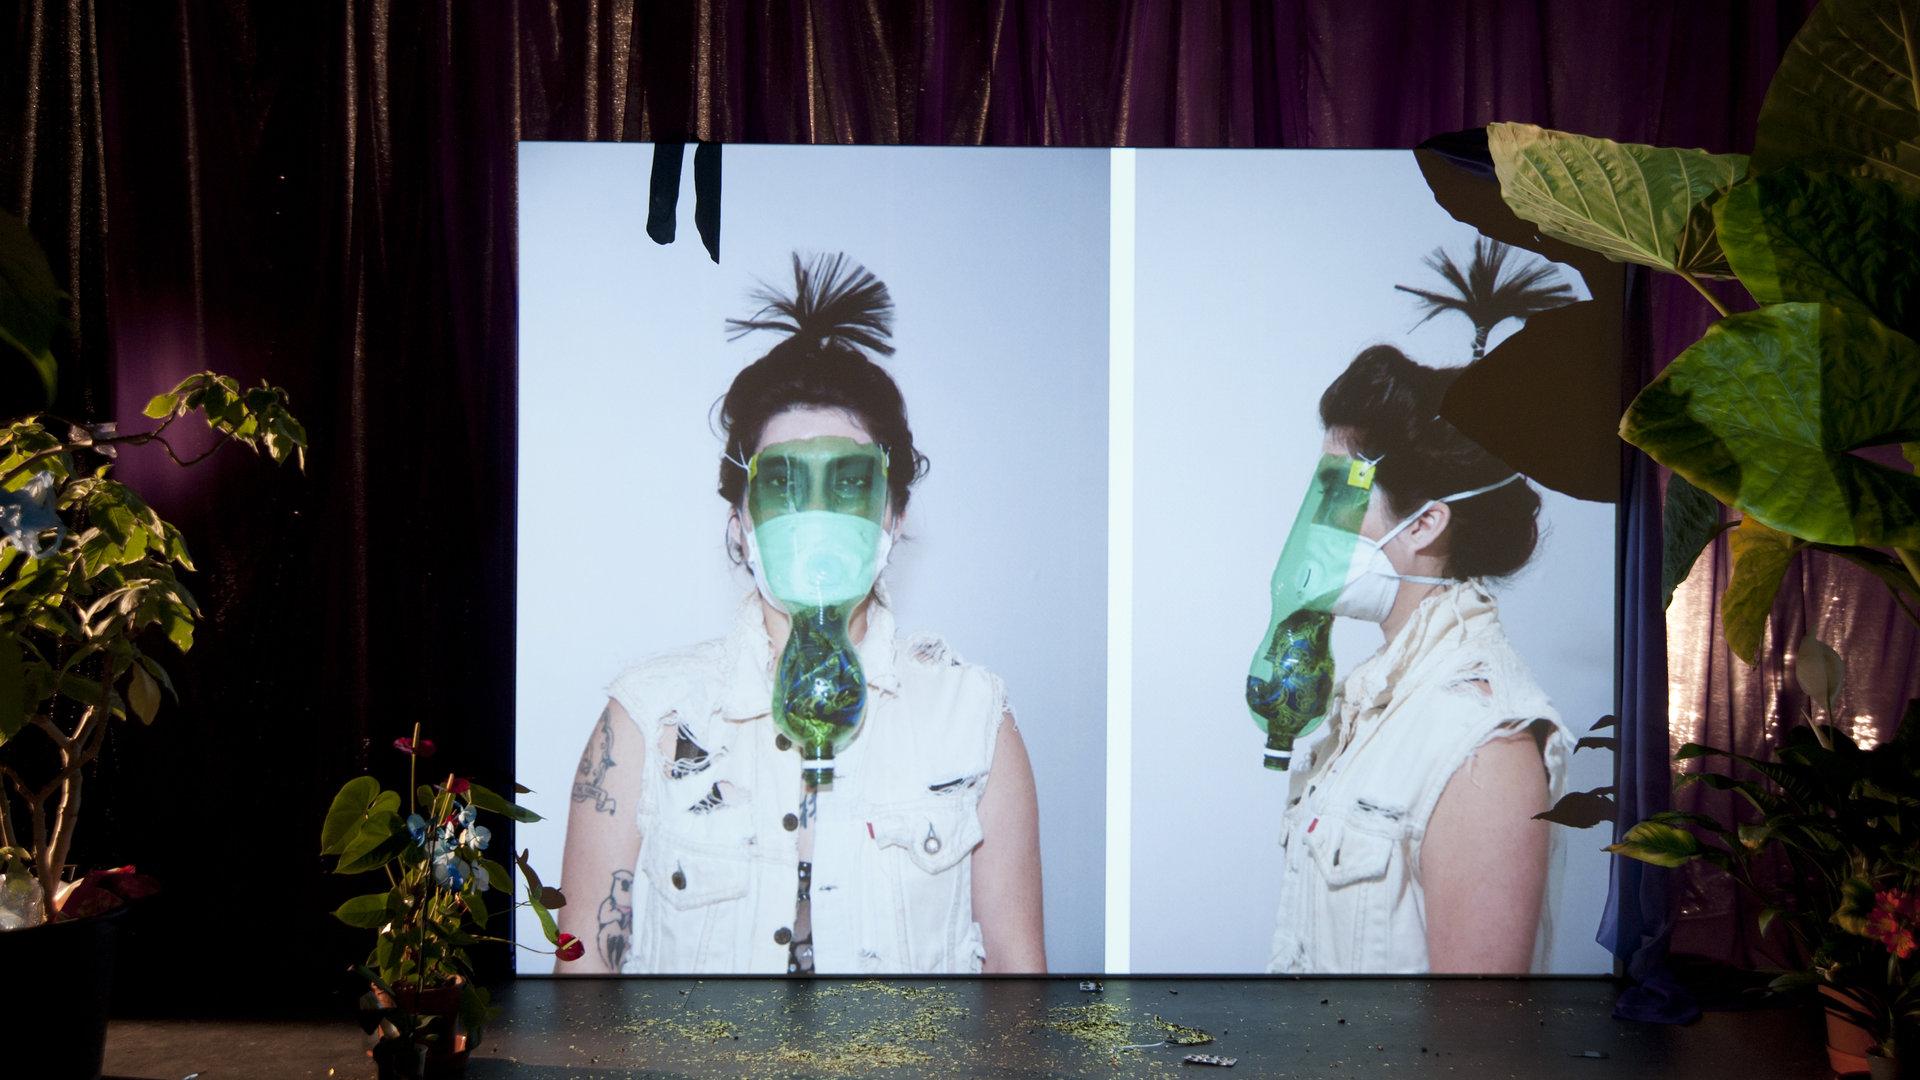 Lorenz-Boudry-Toxic